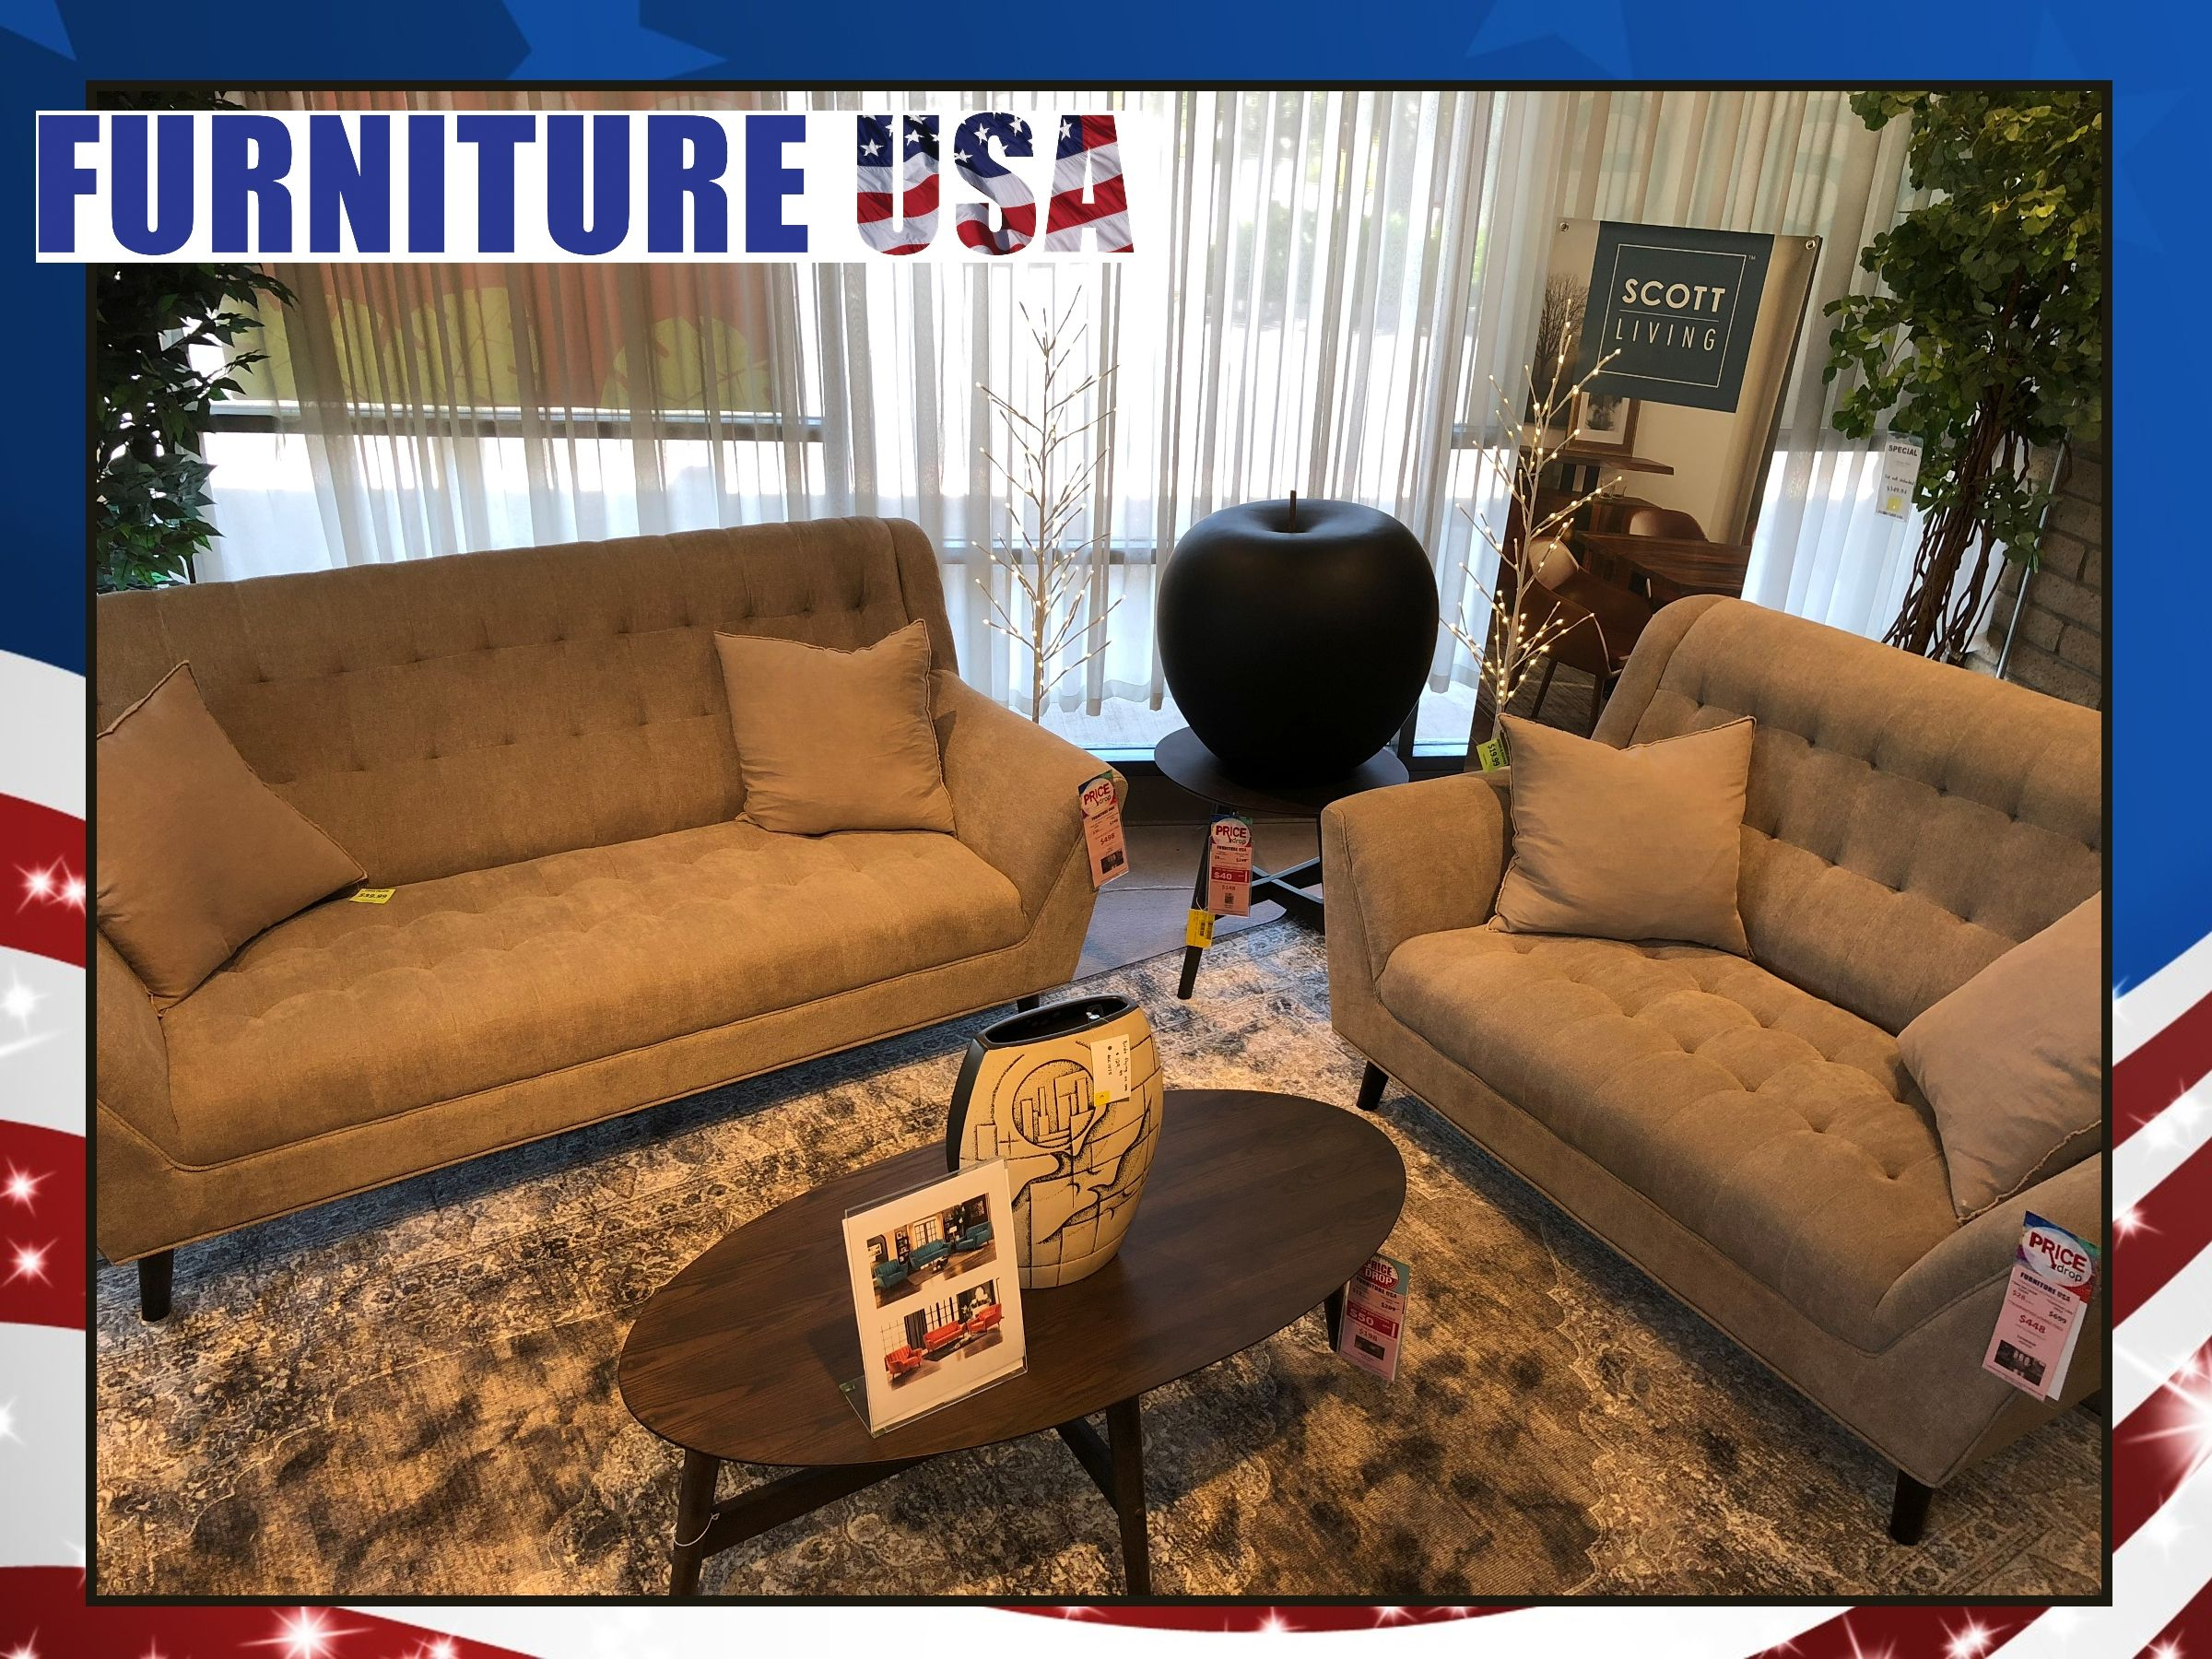 Furniture USA - Daily Deals · Low Price Guarantee ...